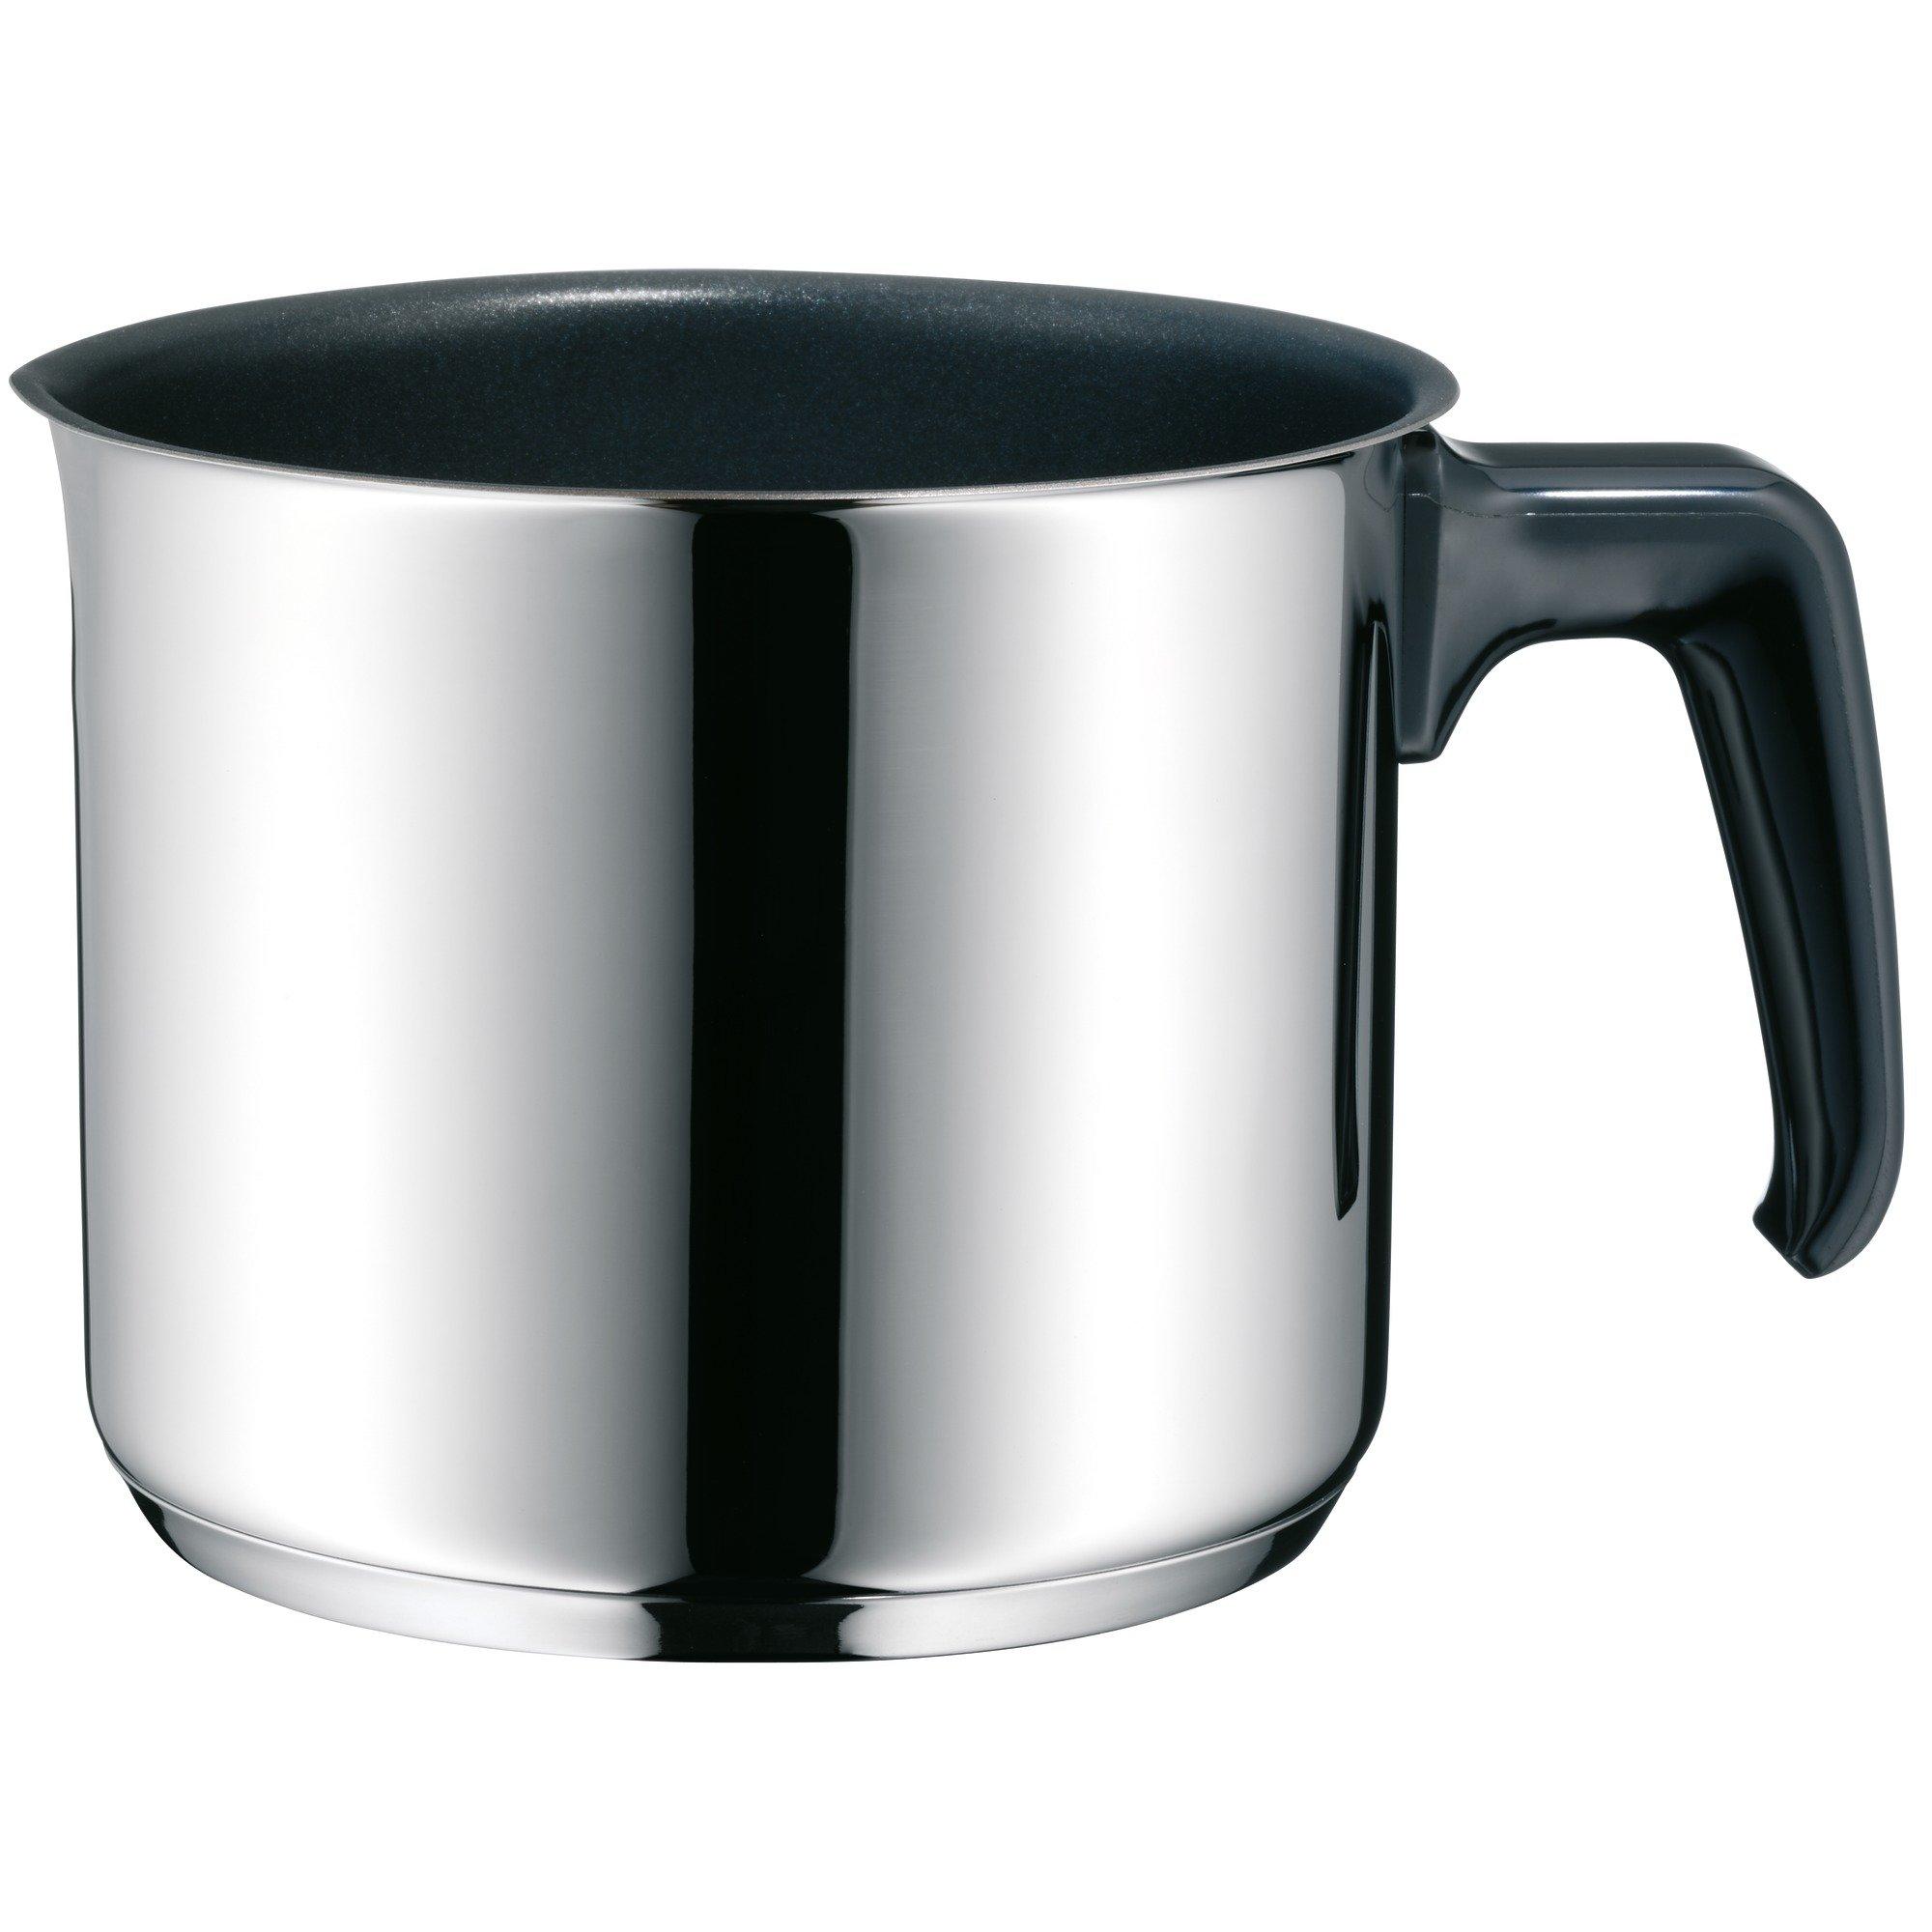 Milchtopf Ø 14 cm